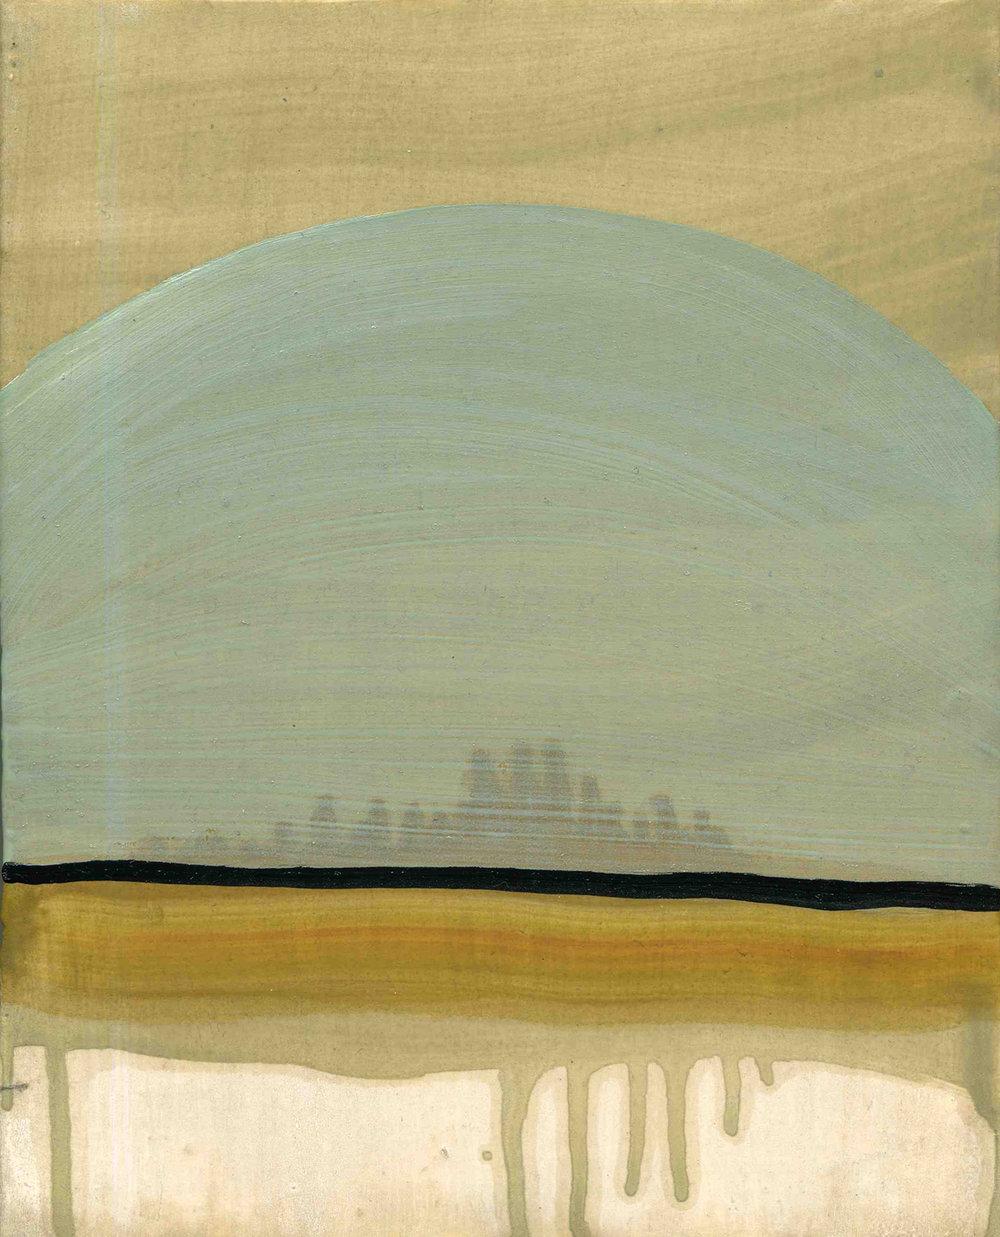 Dome, 2009, Oil on half oil ground, 24 x 18 cm